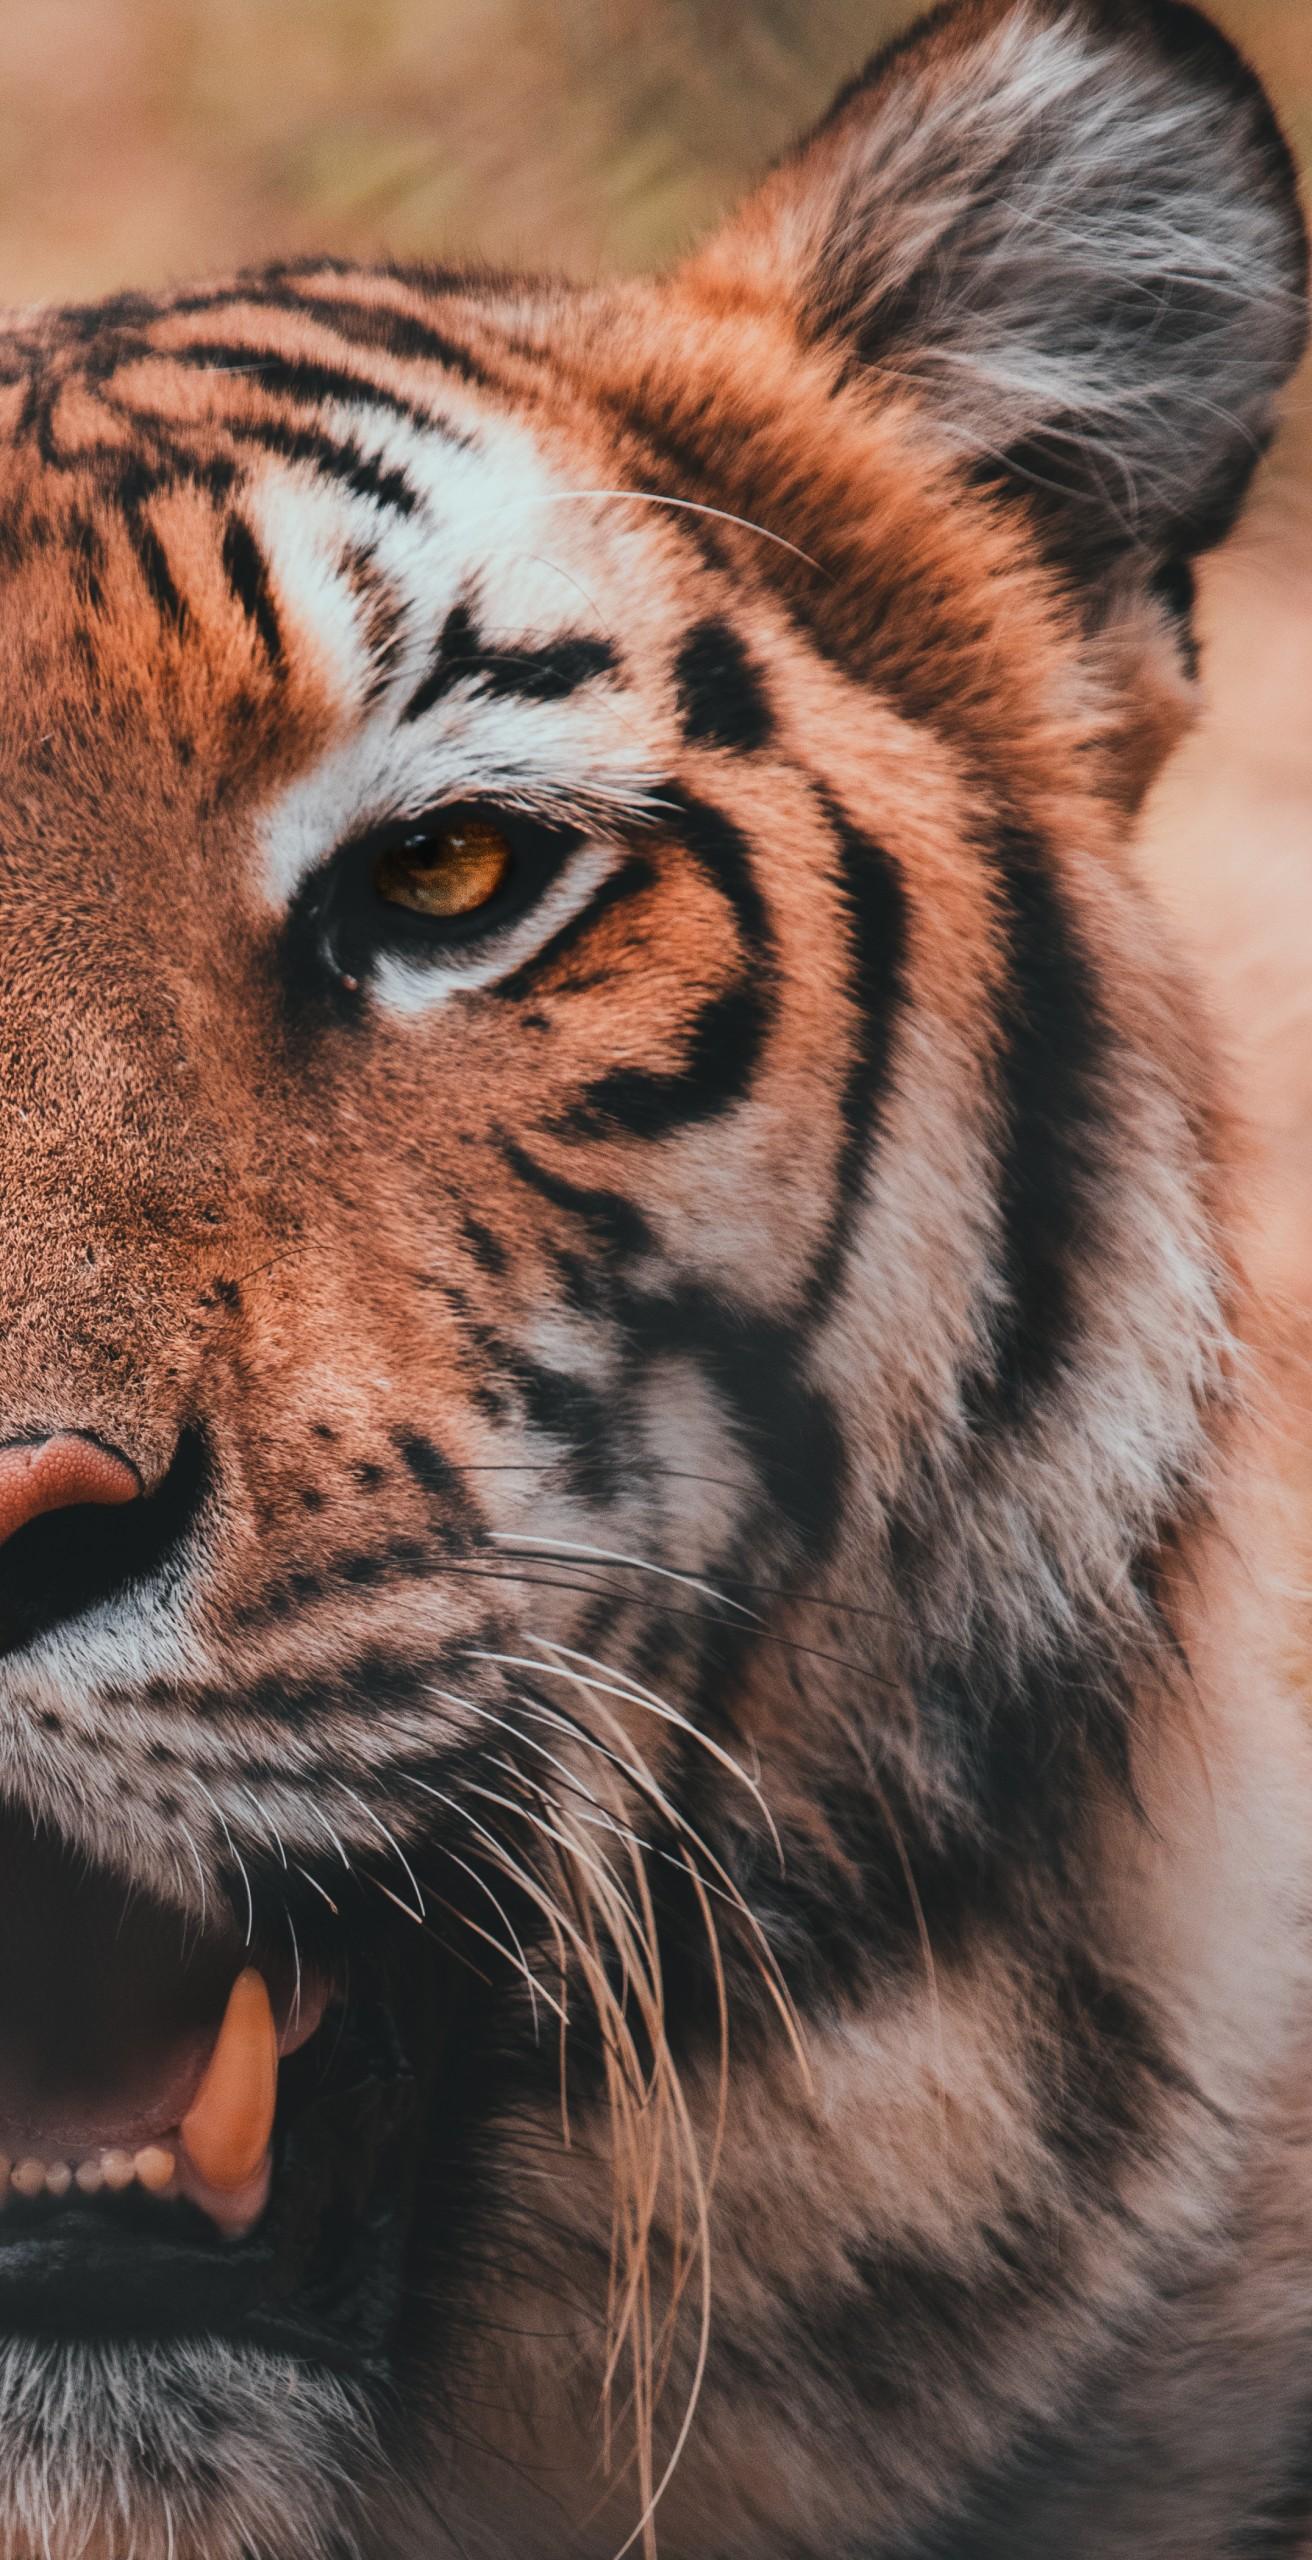 Half portrait of a tiger